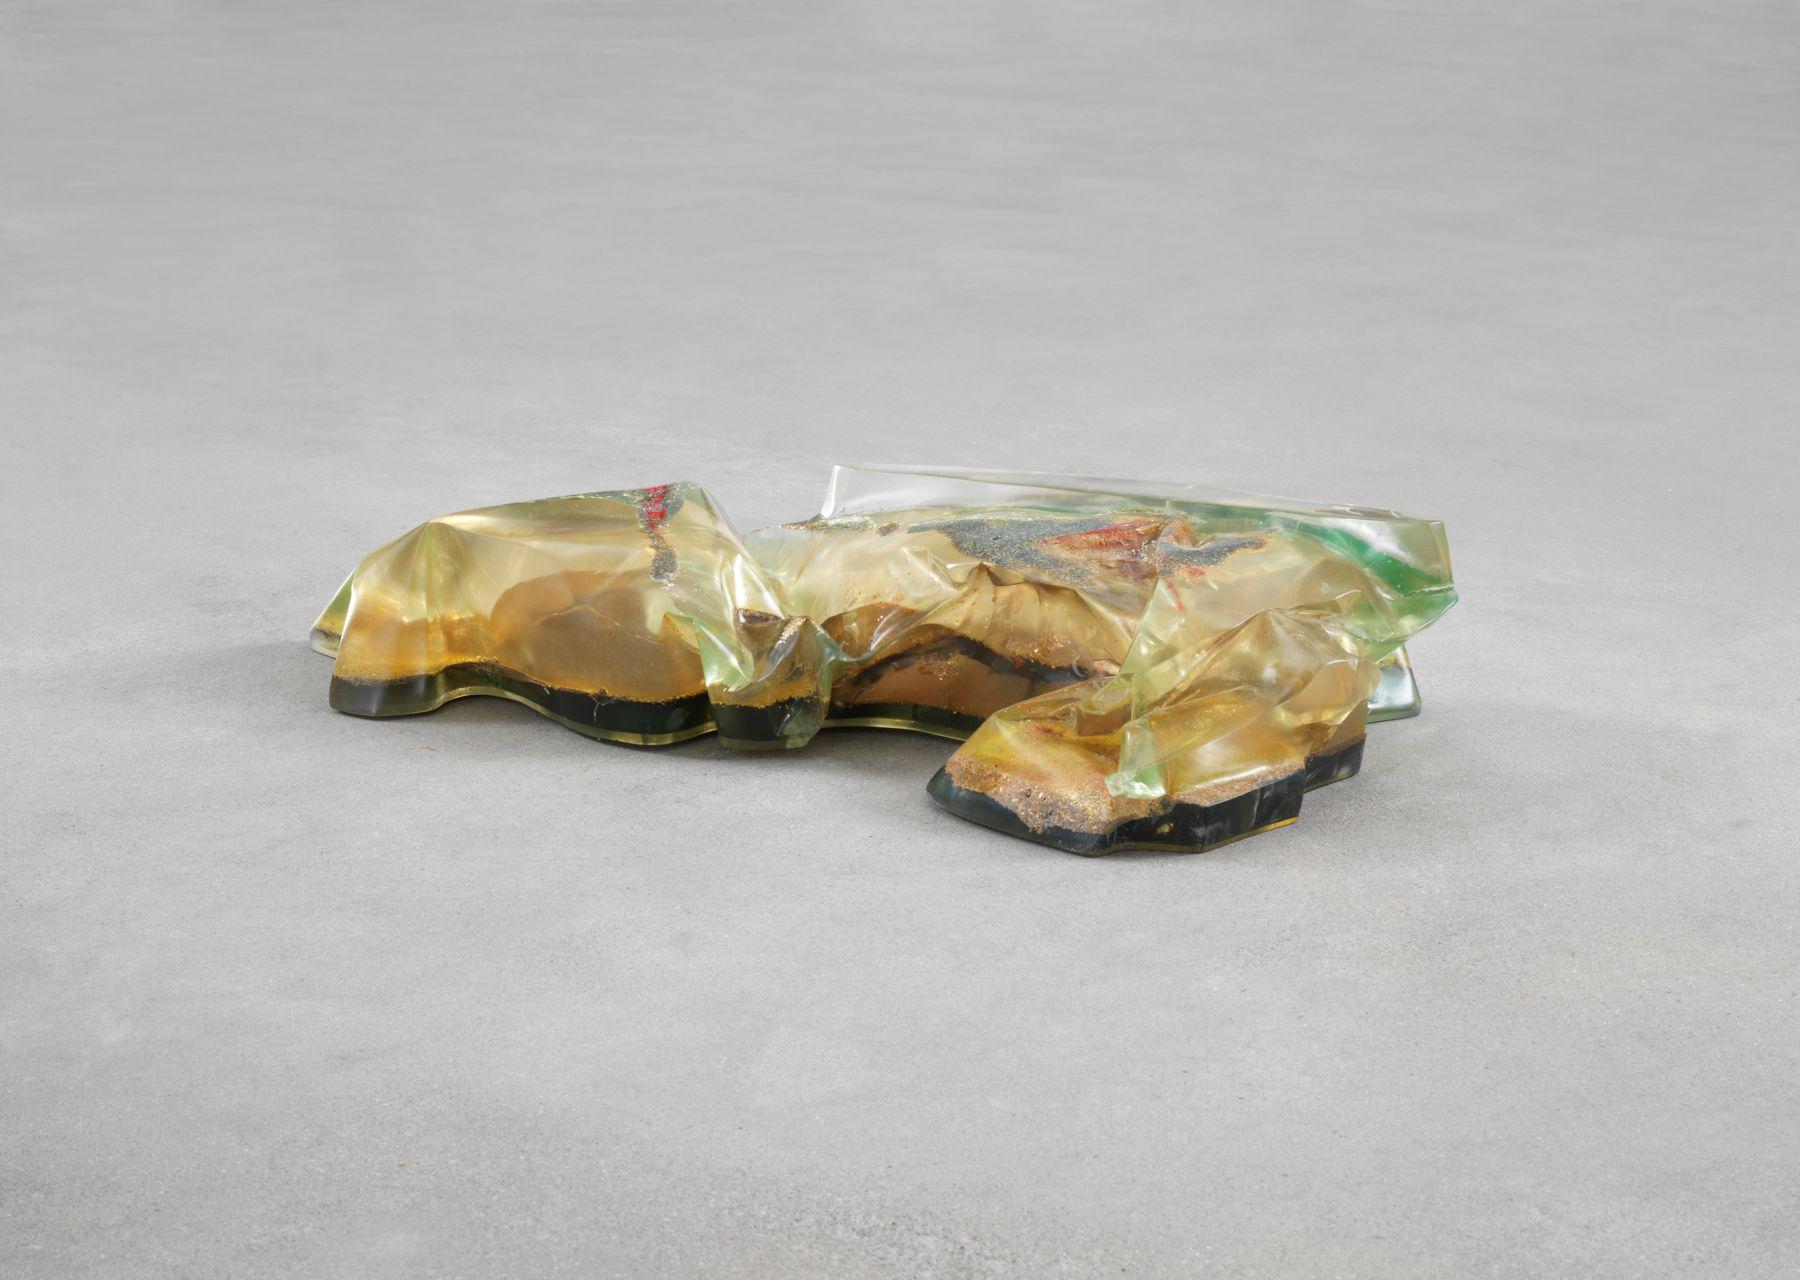 Bennington VI, 1970, Polyester resin, milled glass, plaster, glitter, and dry pigment